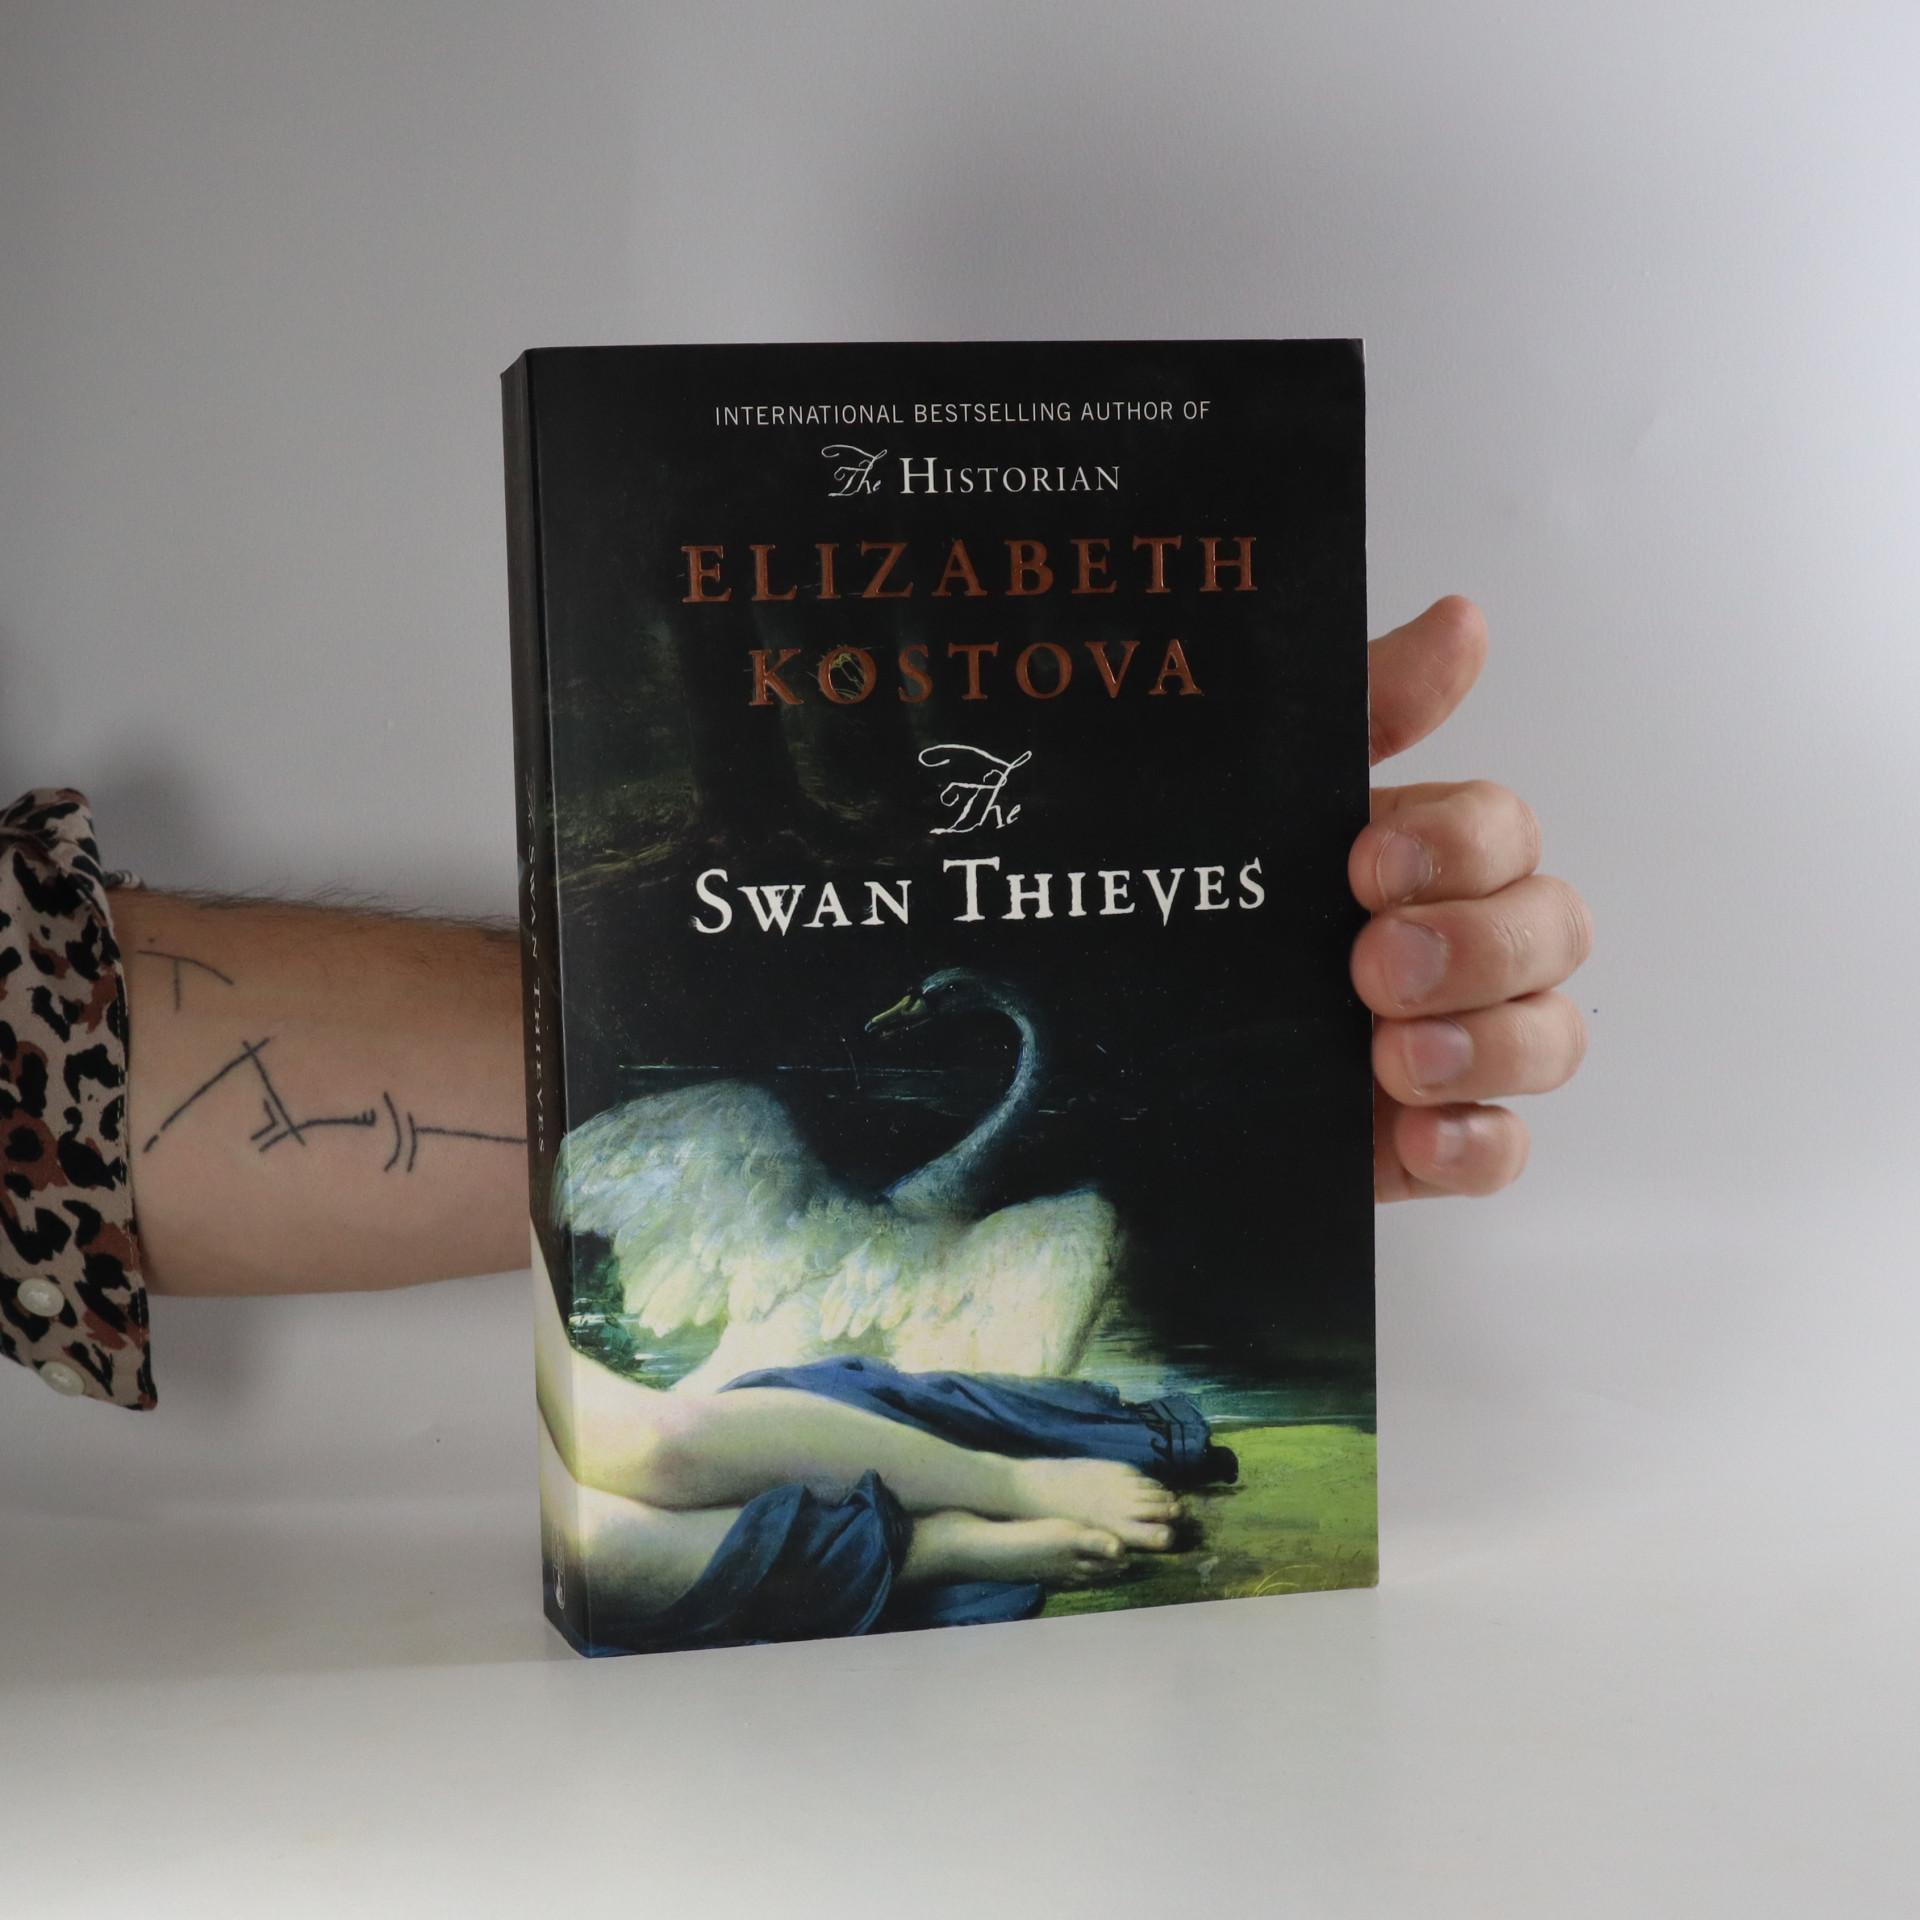 antikvární kniha The swan thieves, 2010